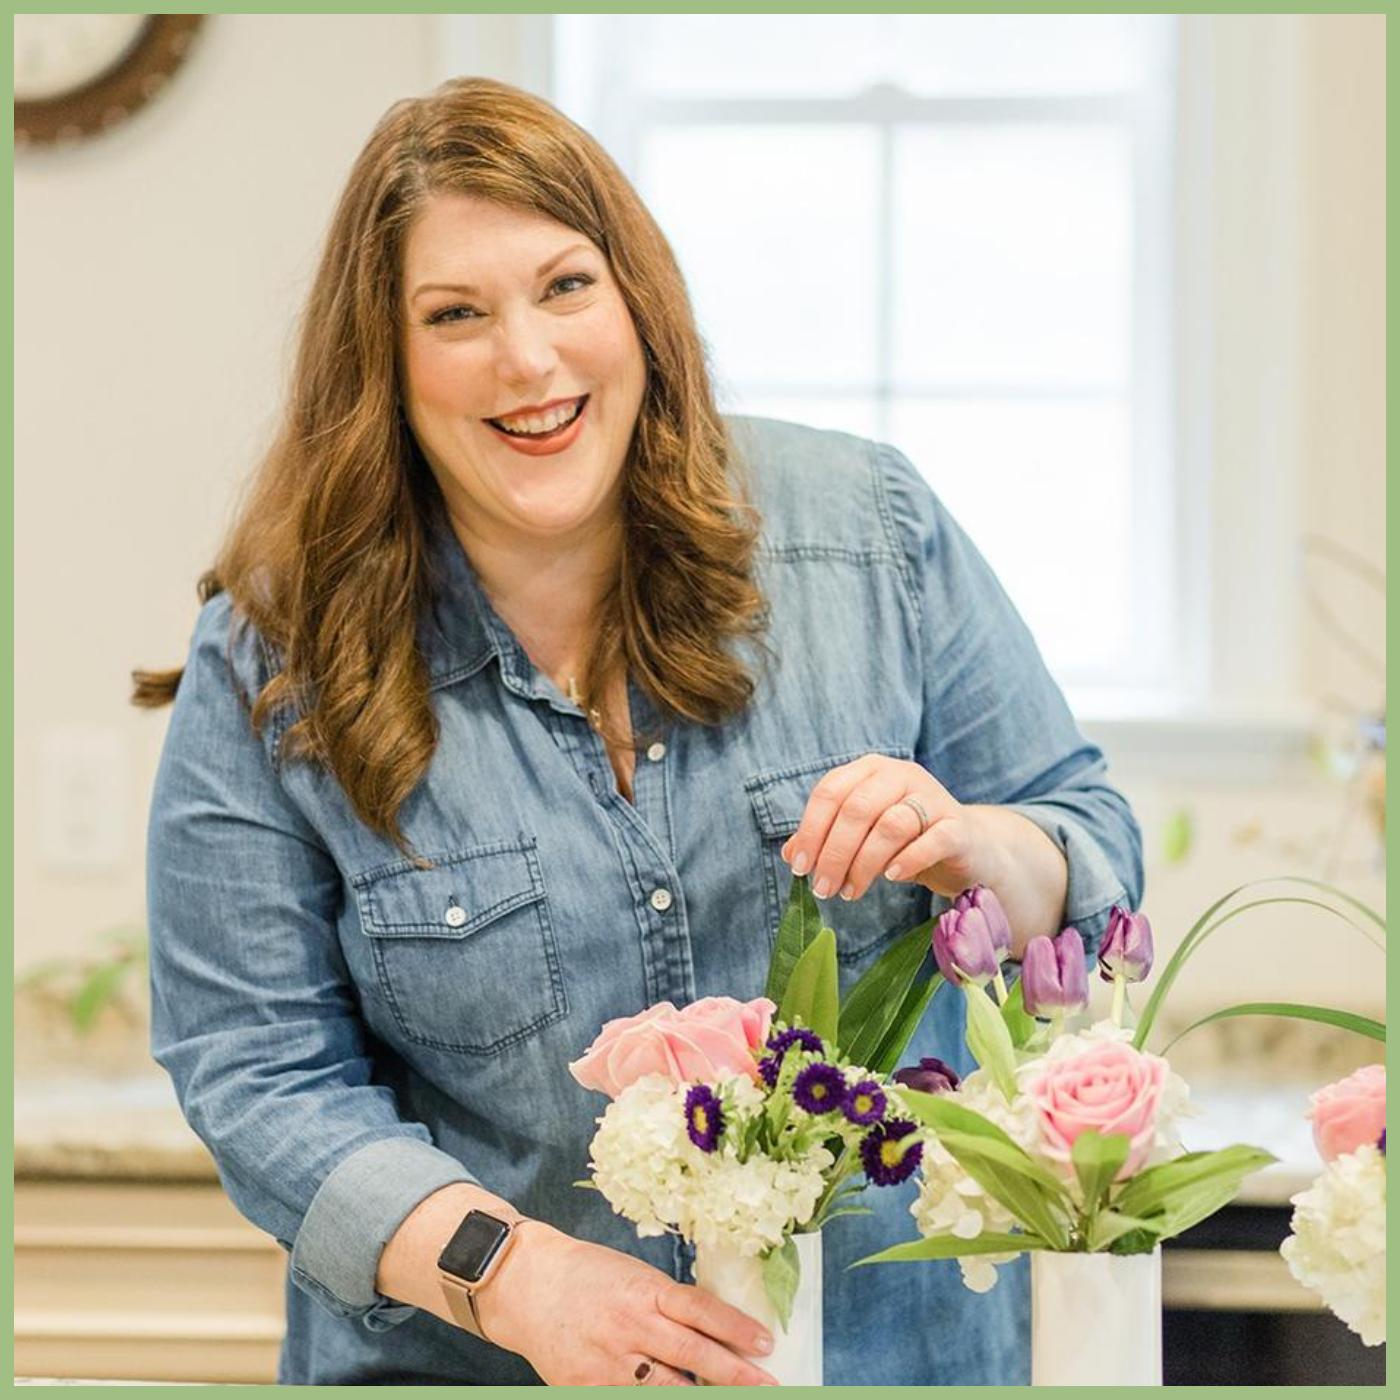 girl smiling and designing flowers Viva La Flora Live Podcast